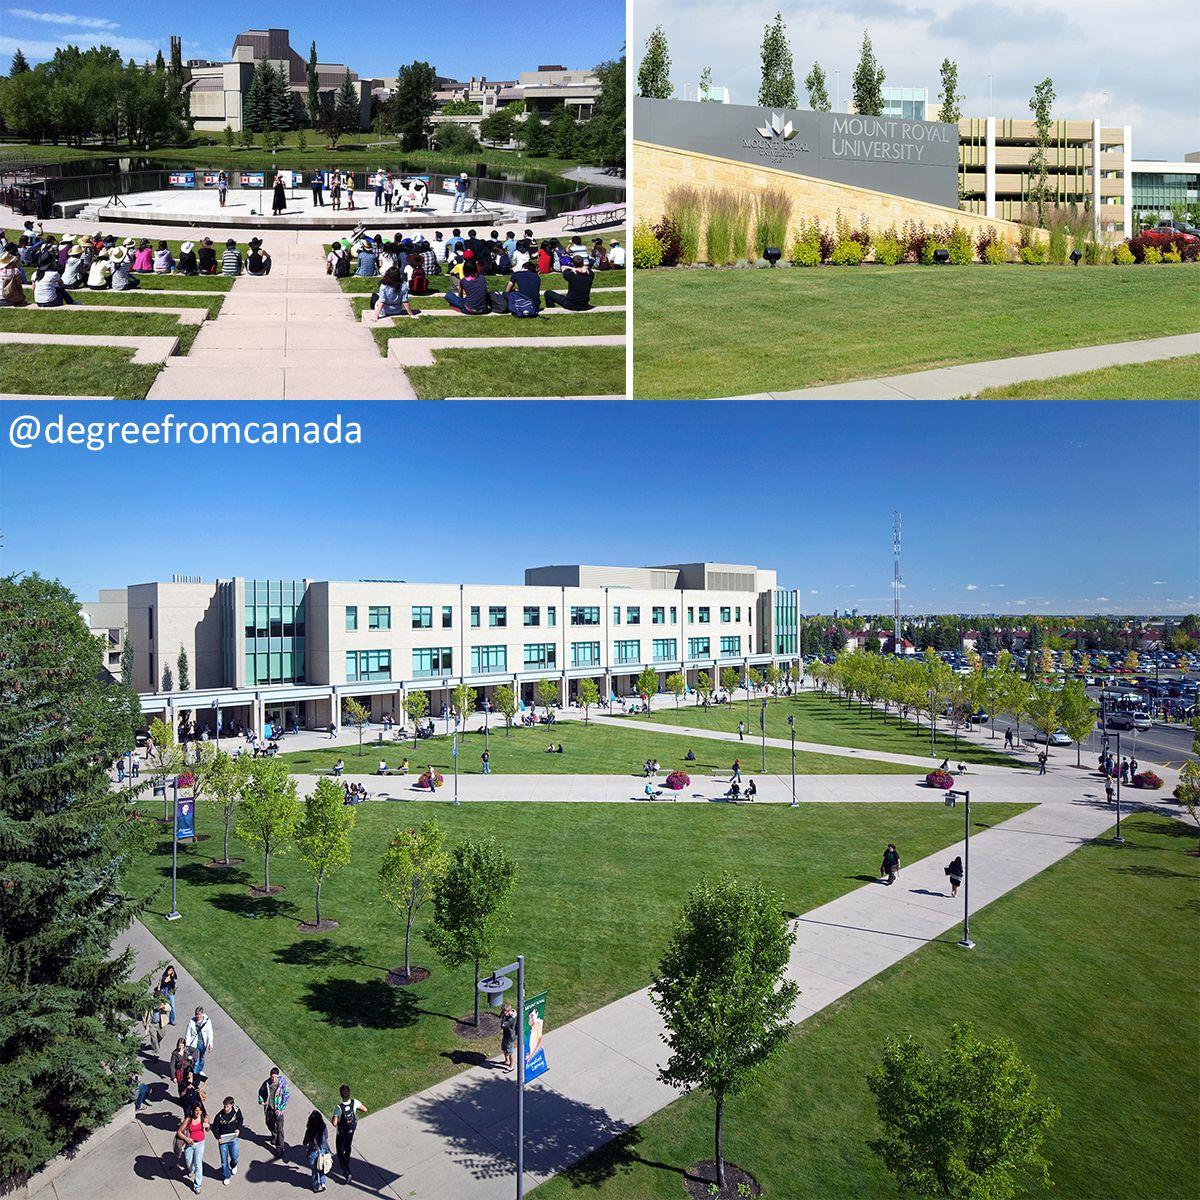 Mount Royal University Mru Is A Public University In Calgary